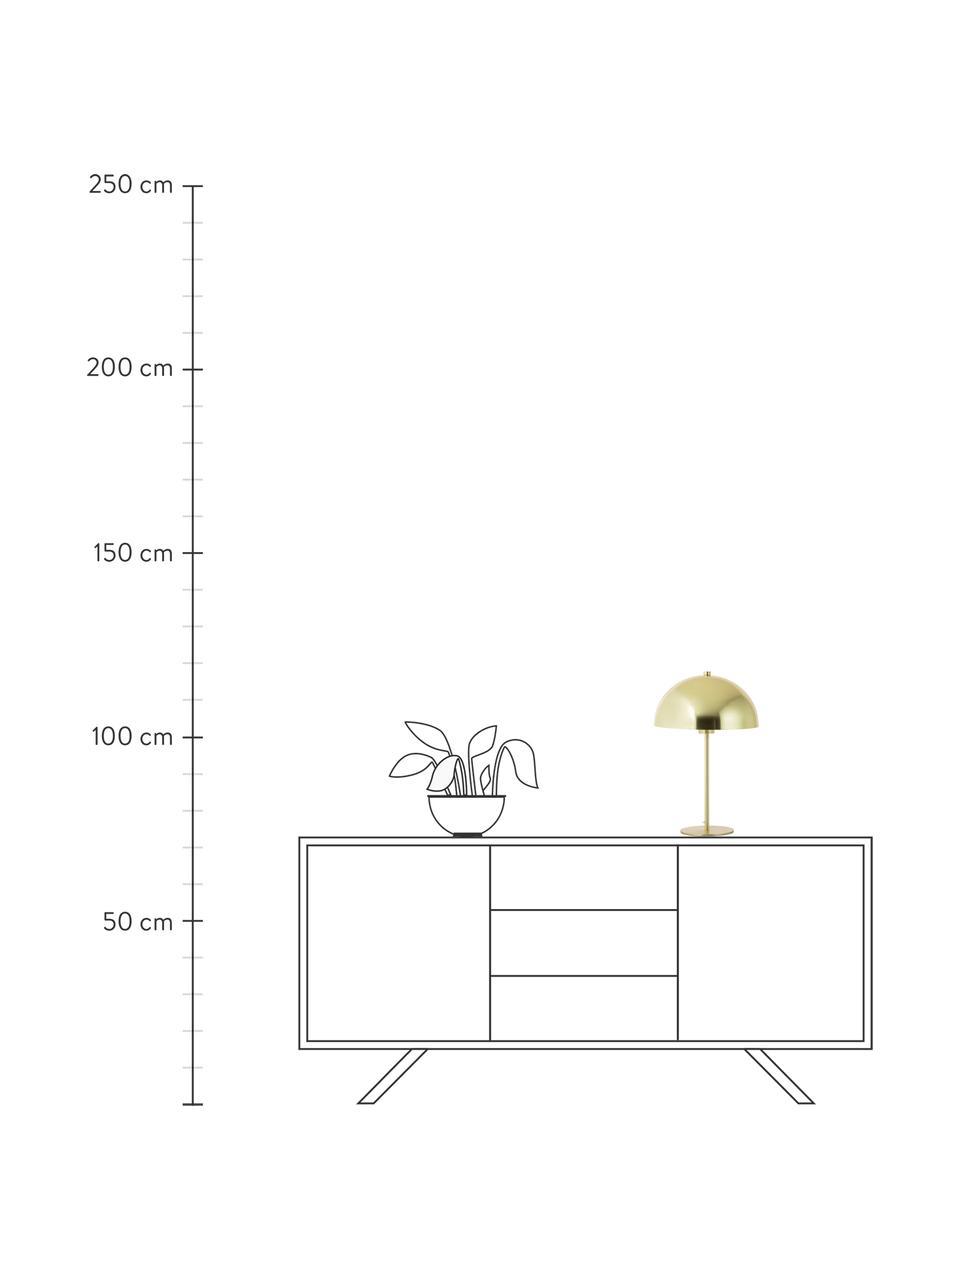 Lampada da tavolo in metallo Matilda, Paralume: metallo ottonato, Base della lampada: metallo ottonato, Ottone, Ø 29 x Alt. 45 cm